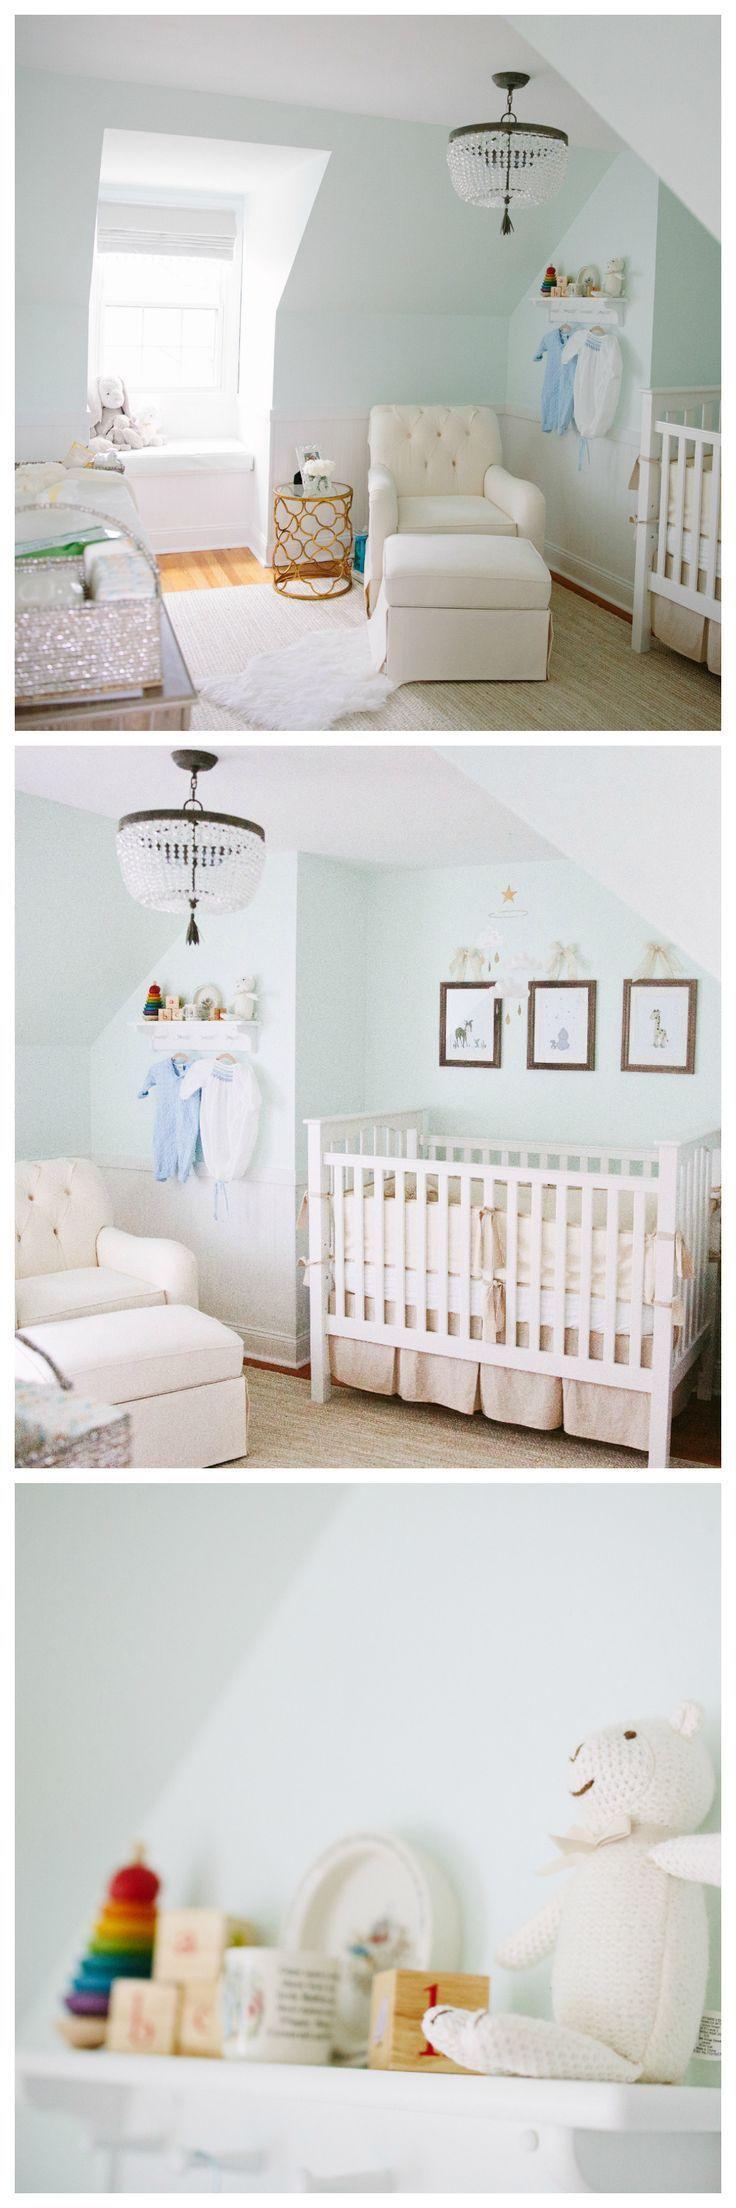 Baby cribs richmond va - Elegant Gender Neutral Nursery A Light And Bright Nursery Perfect For A Baby Boy Or